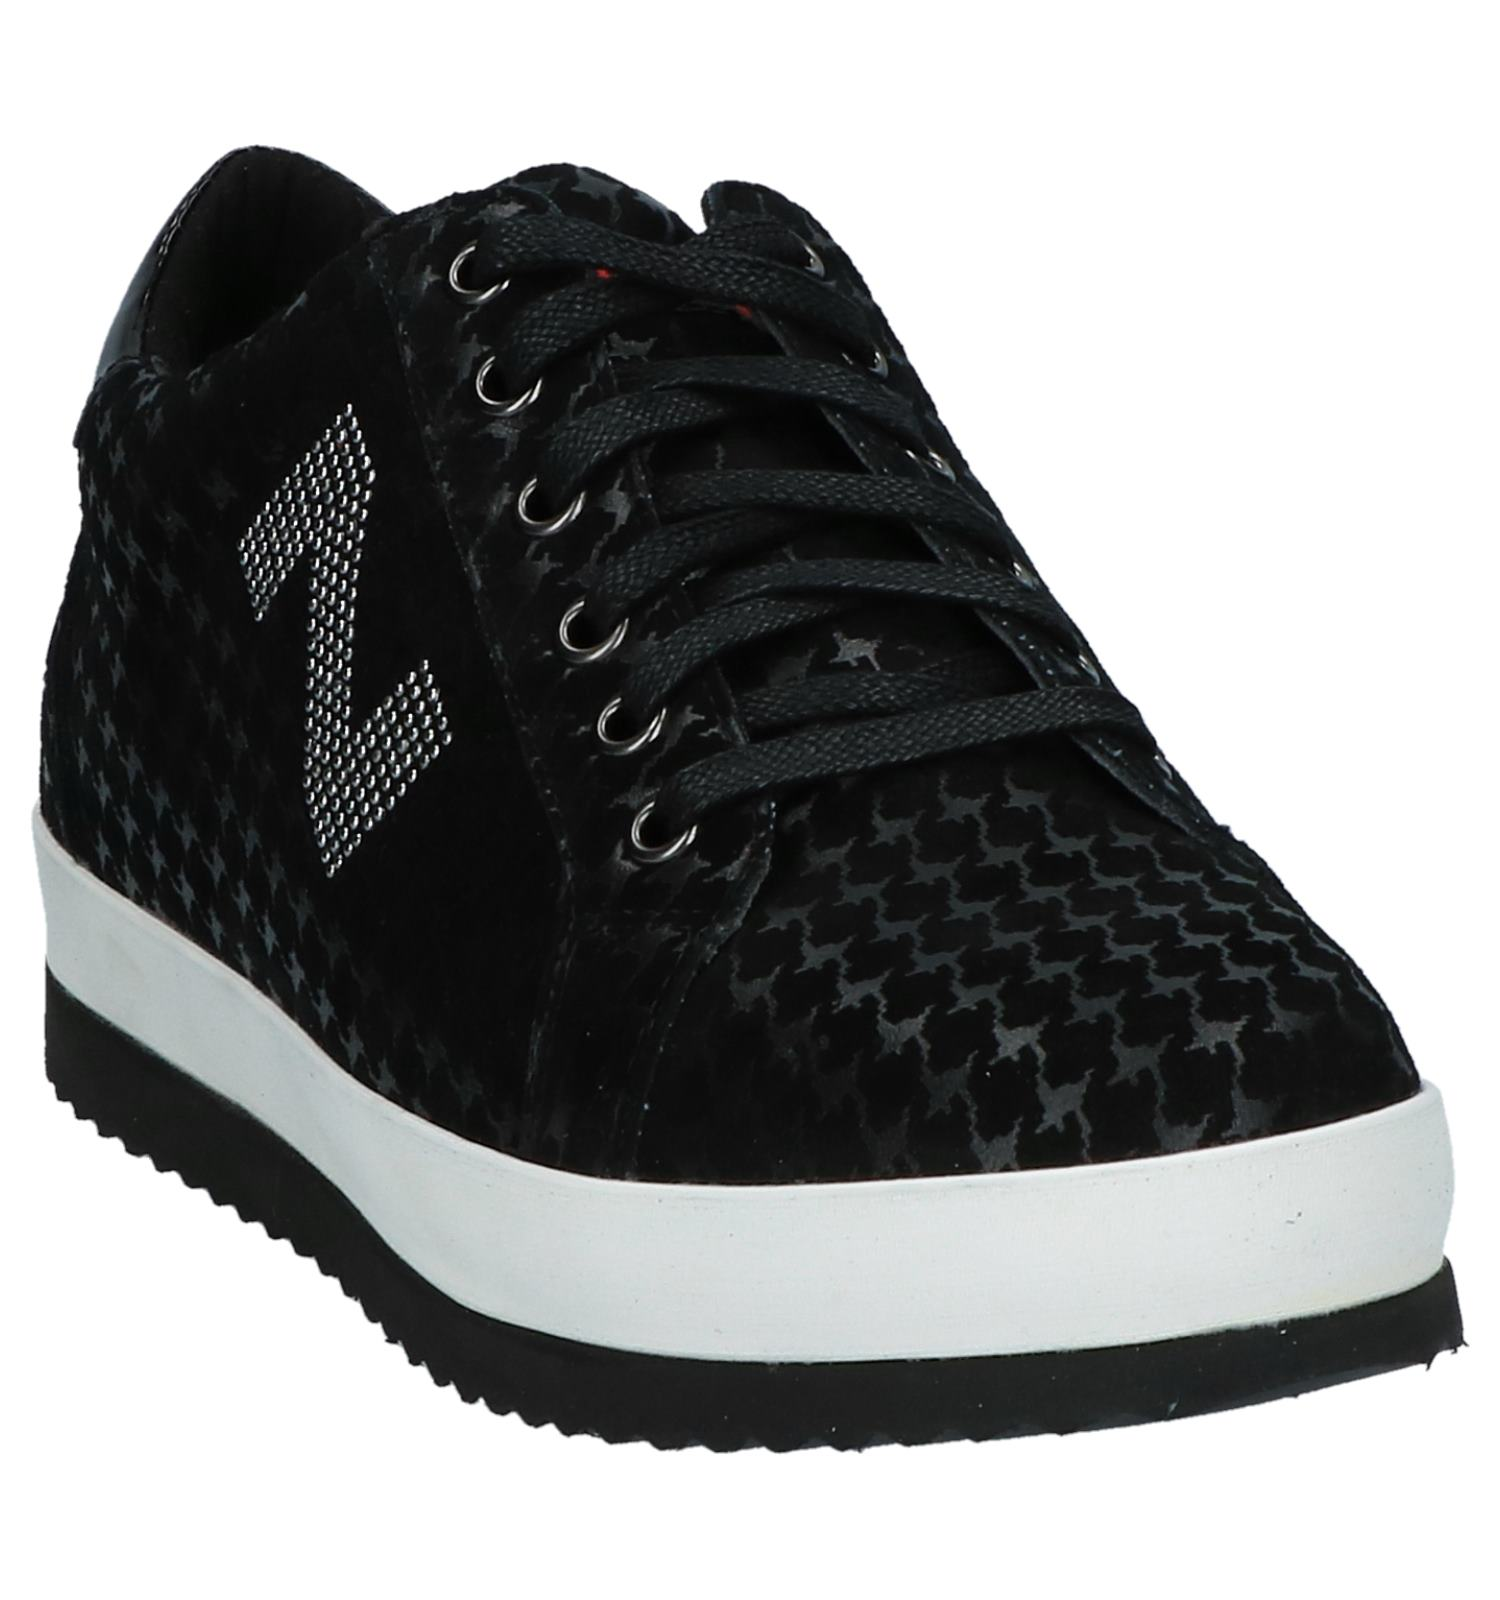 Zwarte Nathan Zwarte Sneakers Nathan Sport Nathan Sneakers Sport Zwarte Zwarte Sport Nathan Sneakers Sport f7gvbY6y